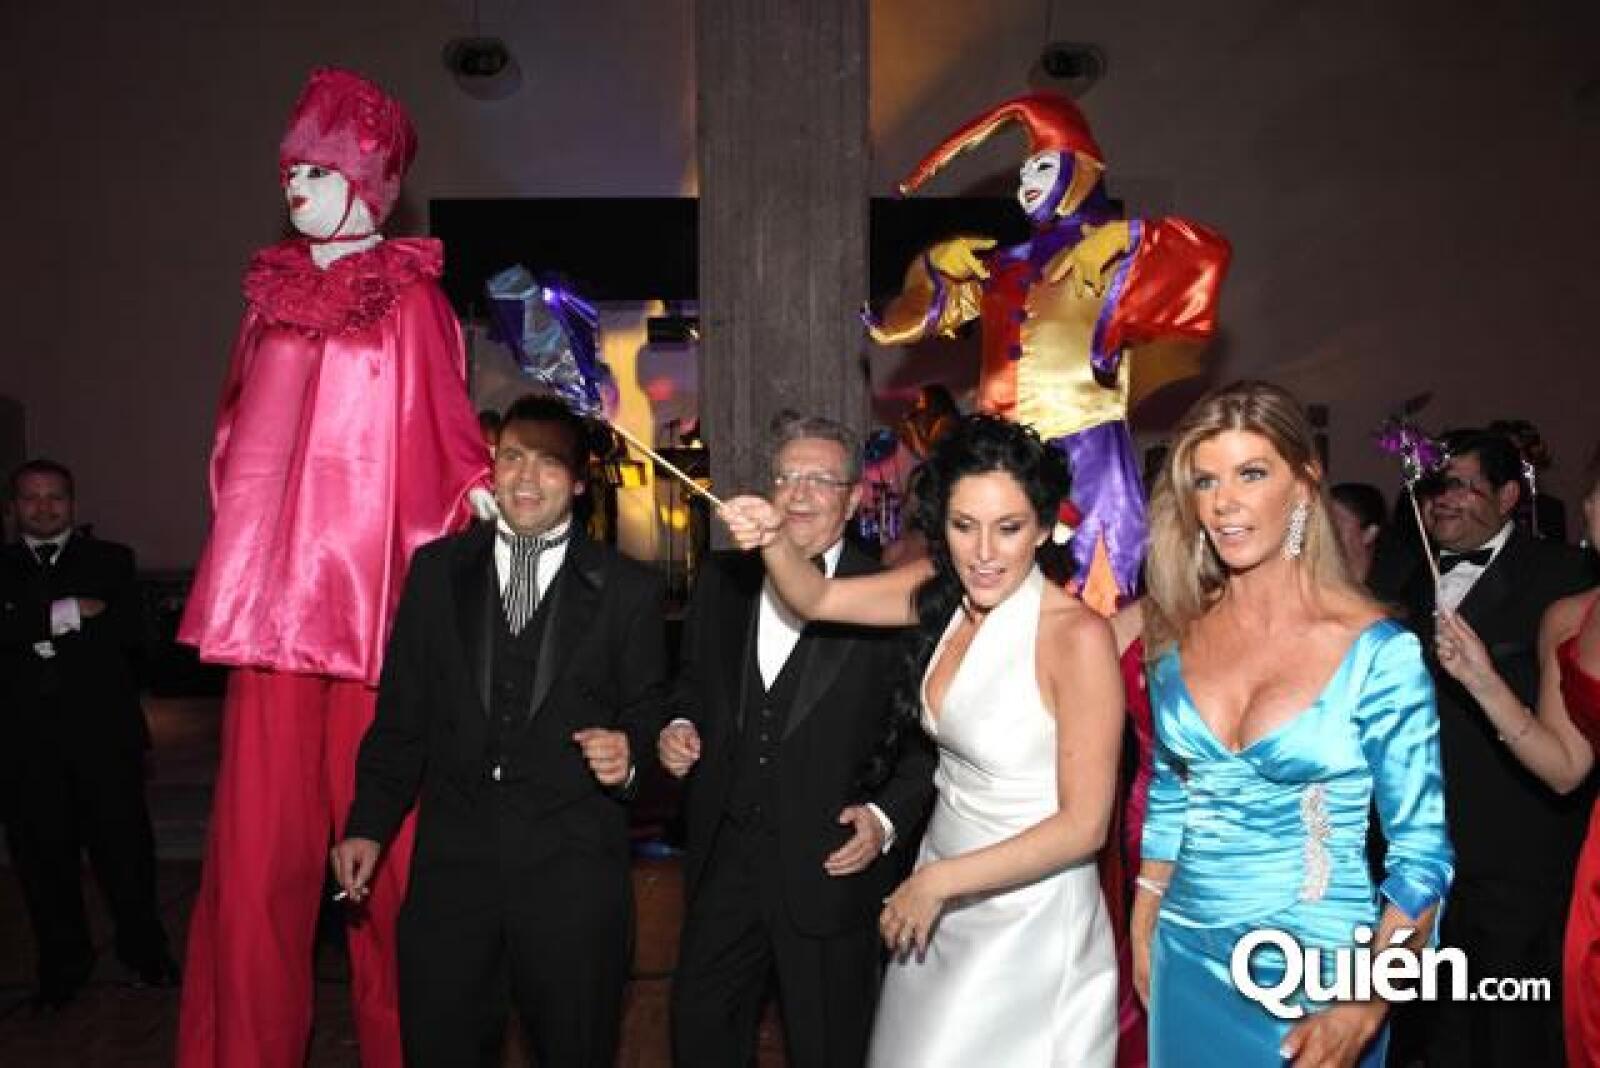 Guillermo Ochoa,Guillermo Ochoa,Danielle Dithurbide,Denisse Salazar